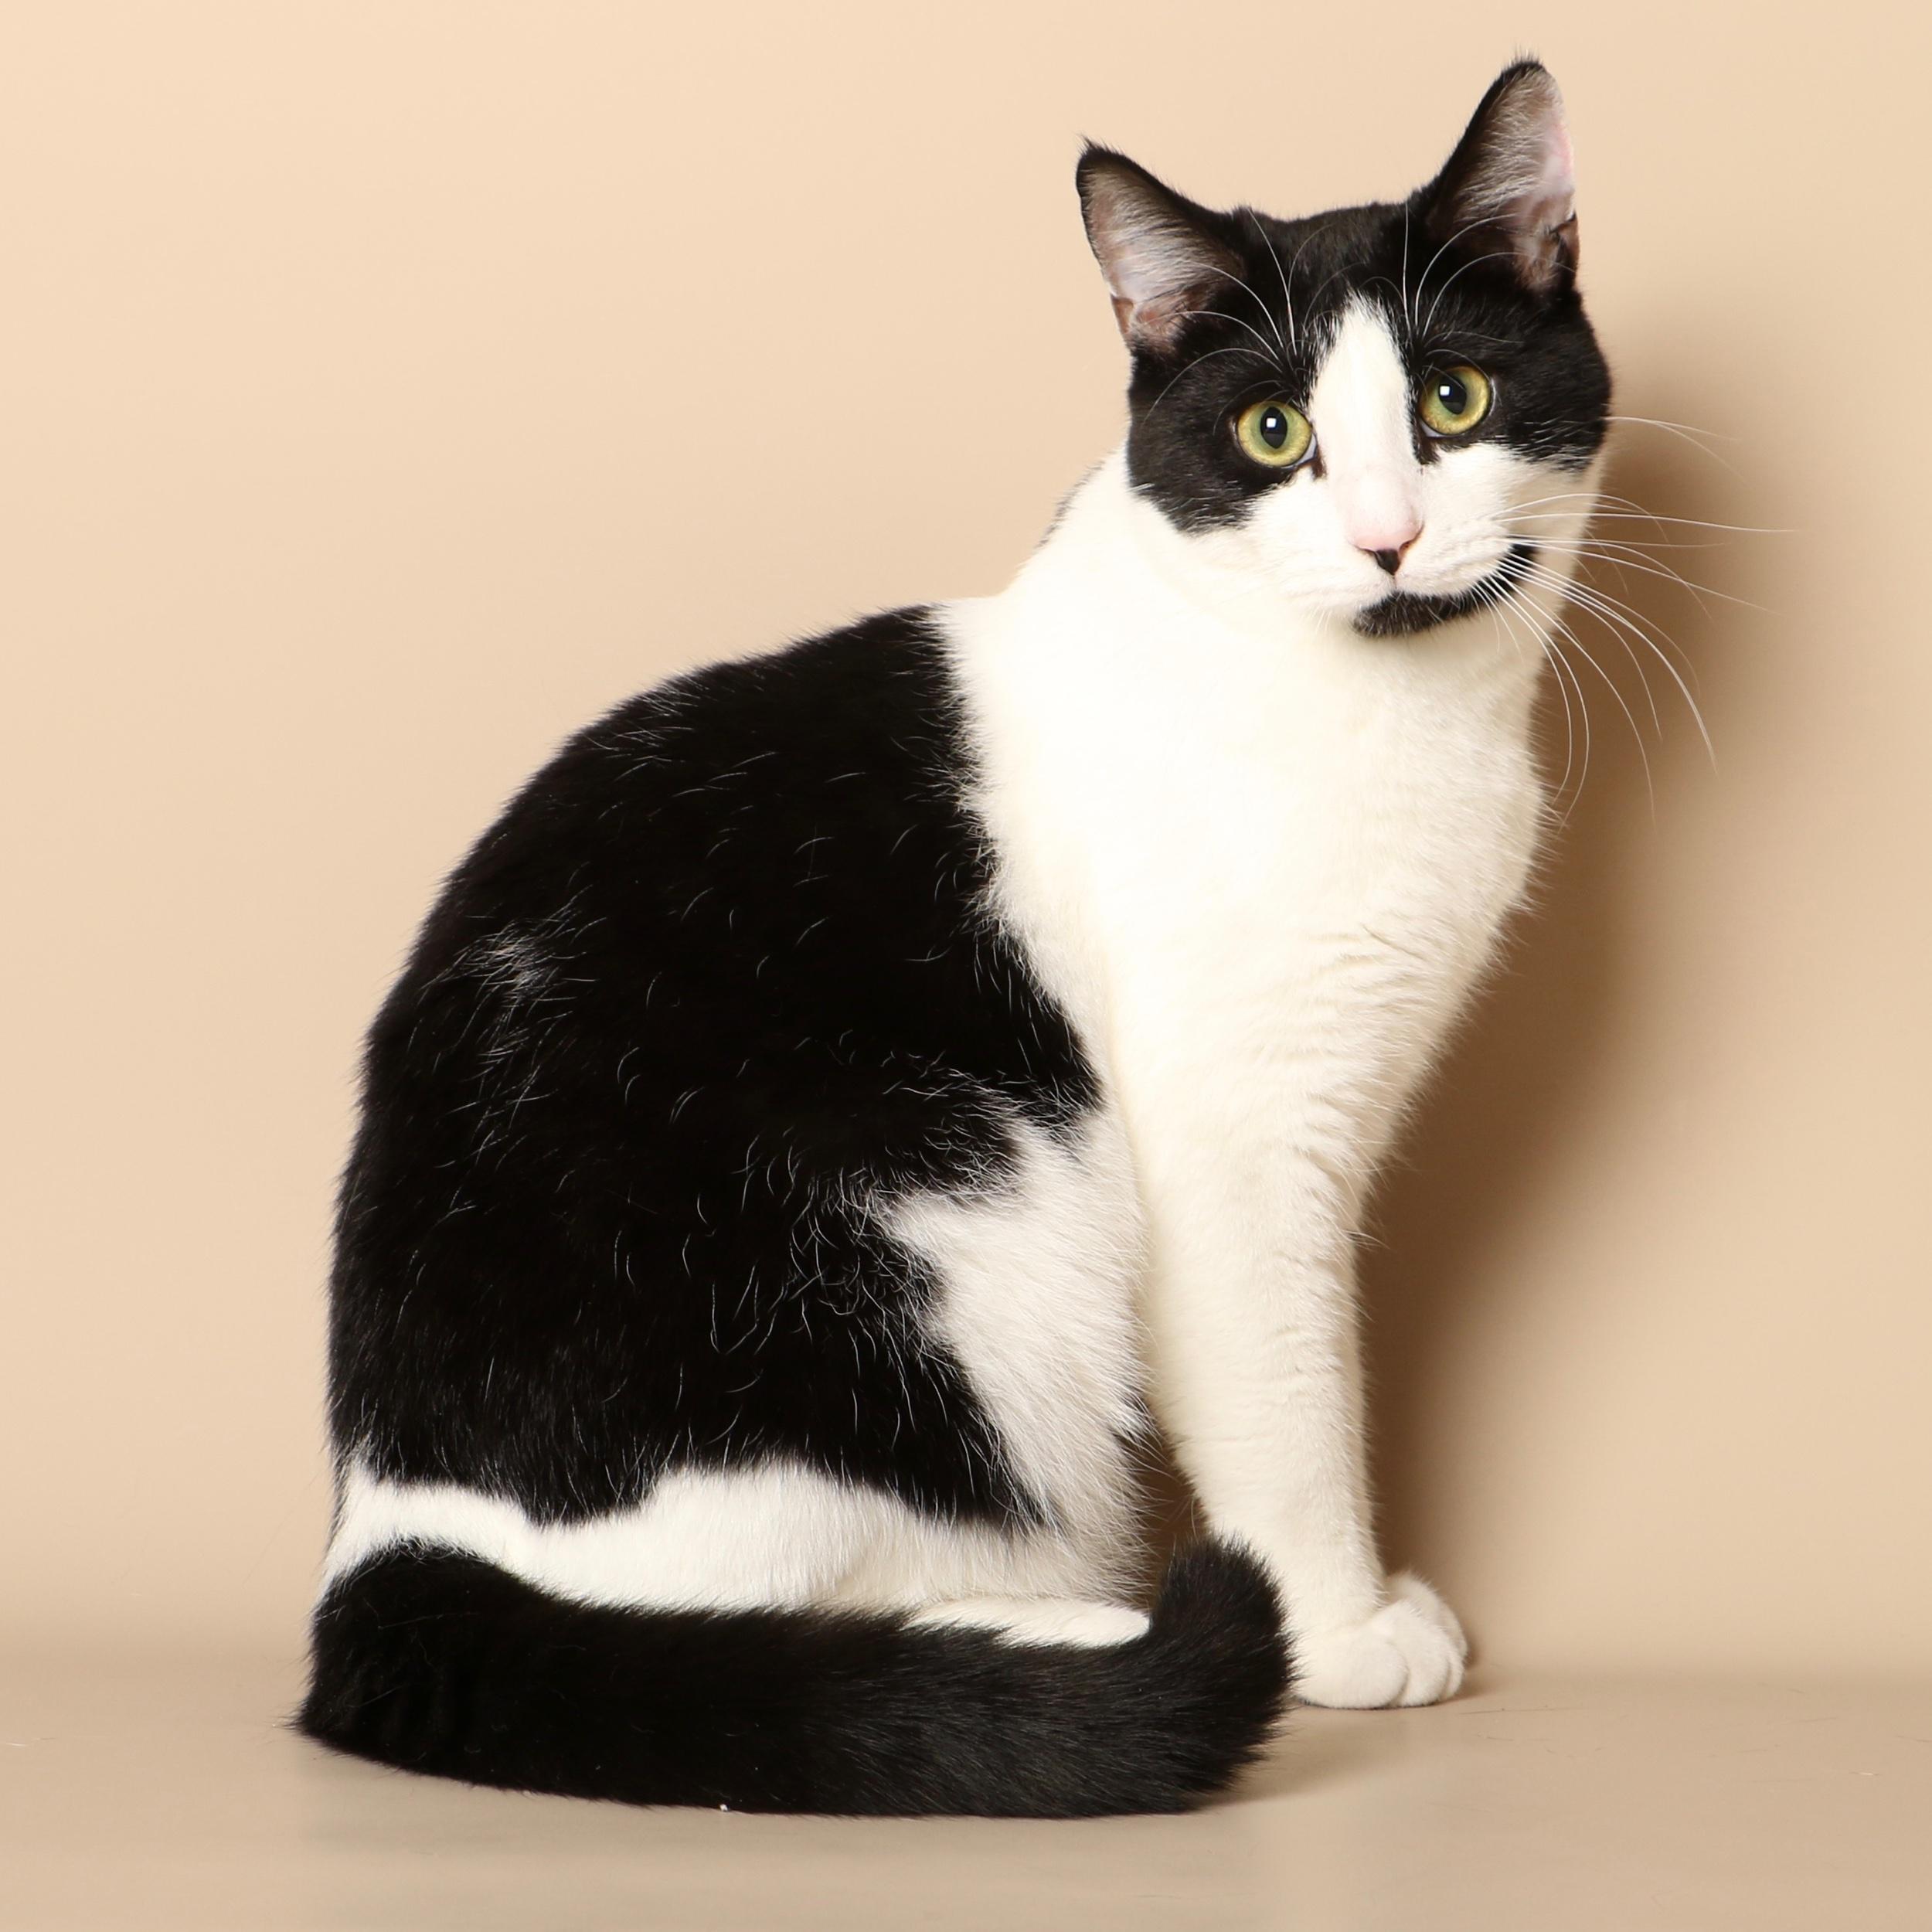 0723cats.jpeg